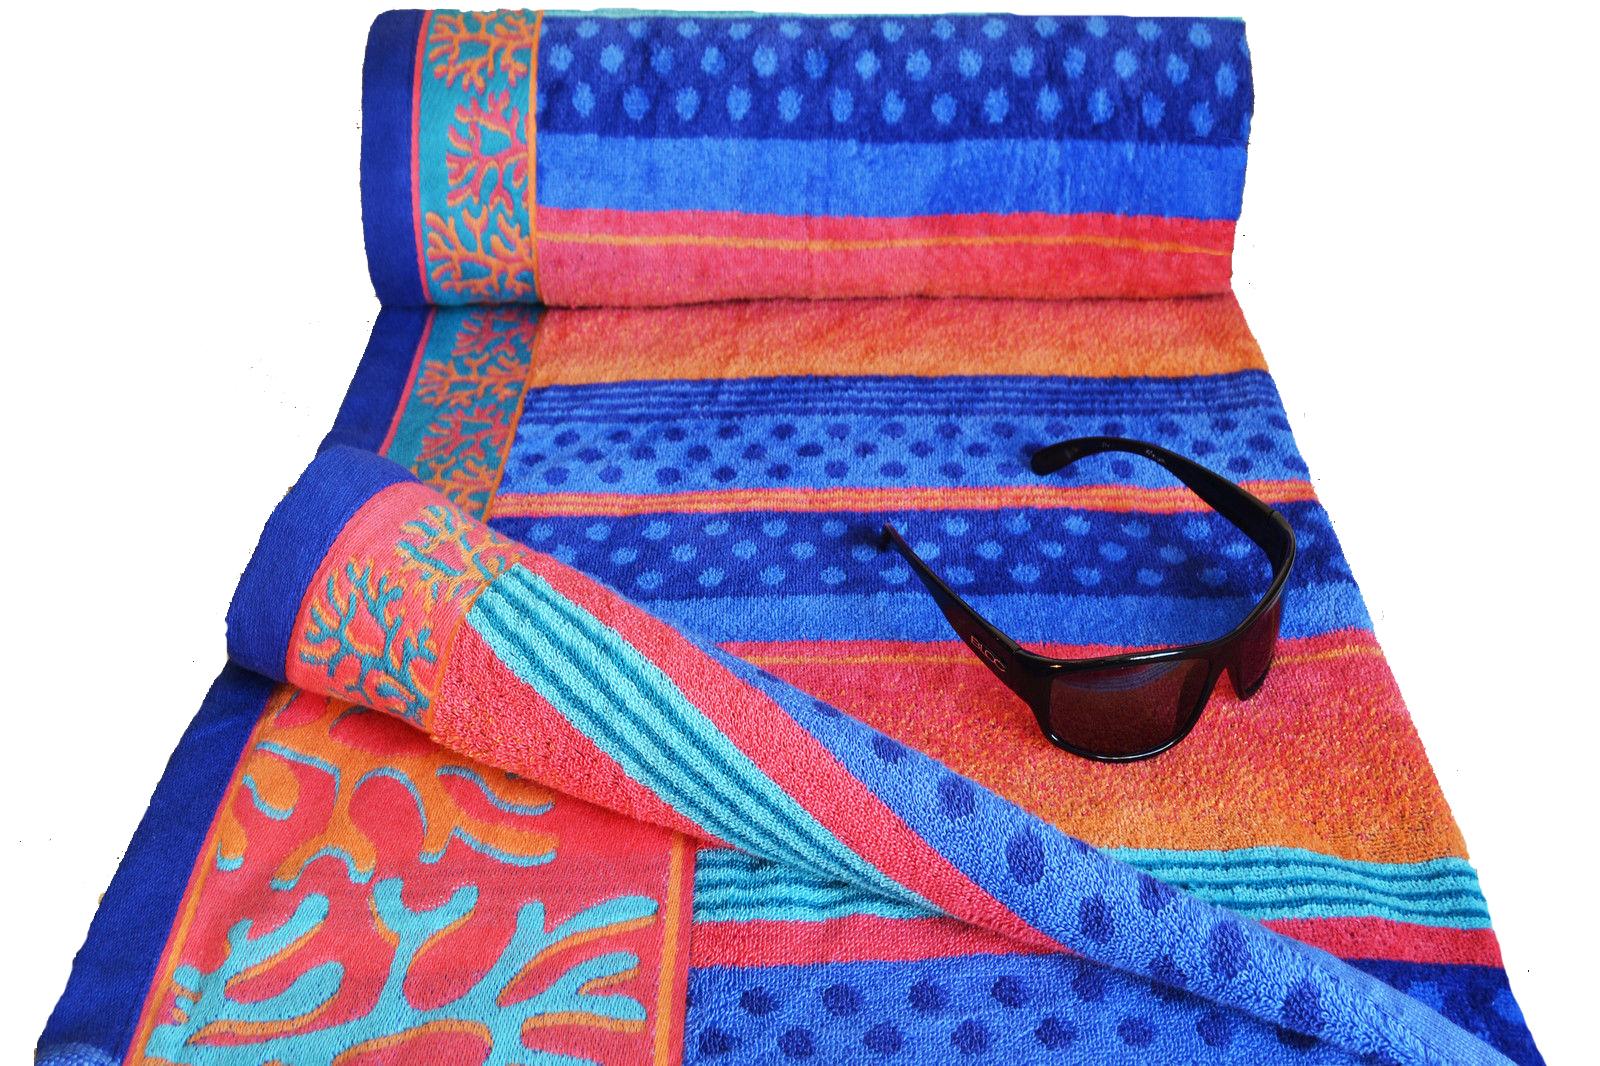 Jumbo Beach Towels Uk